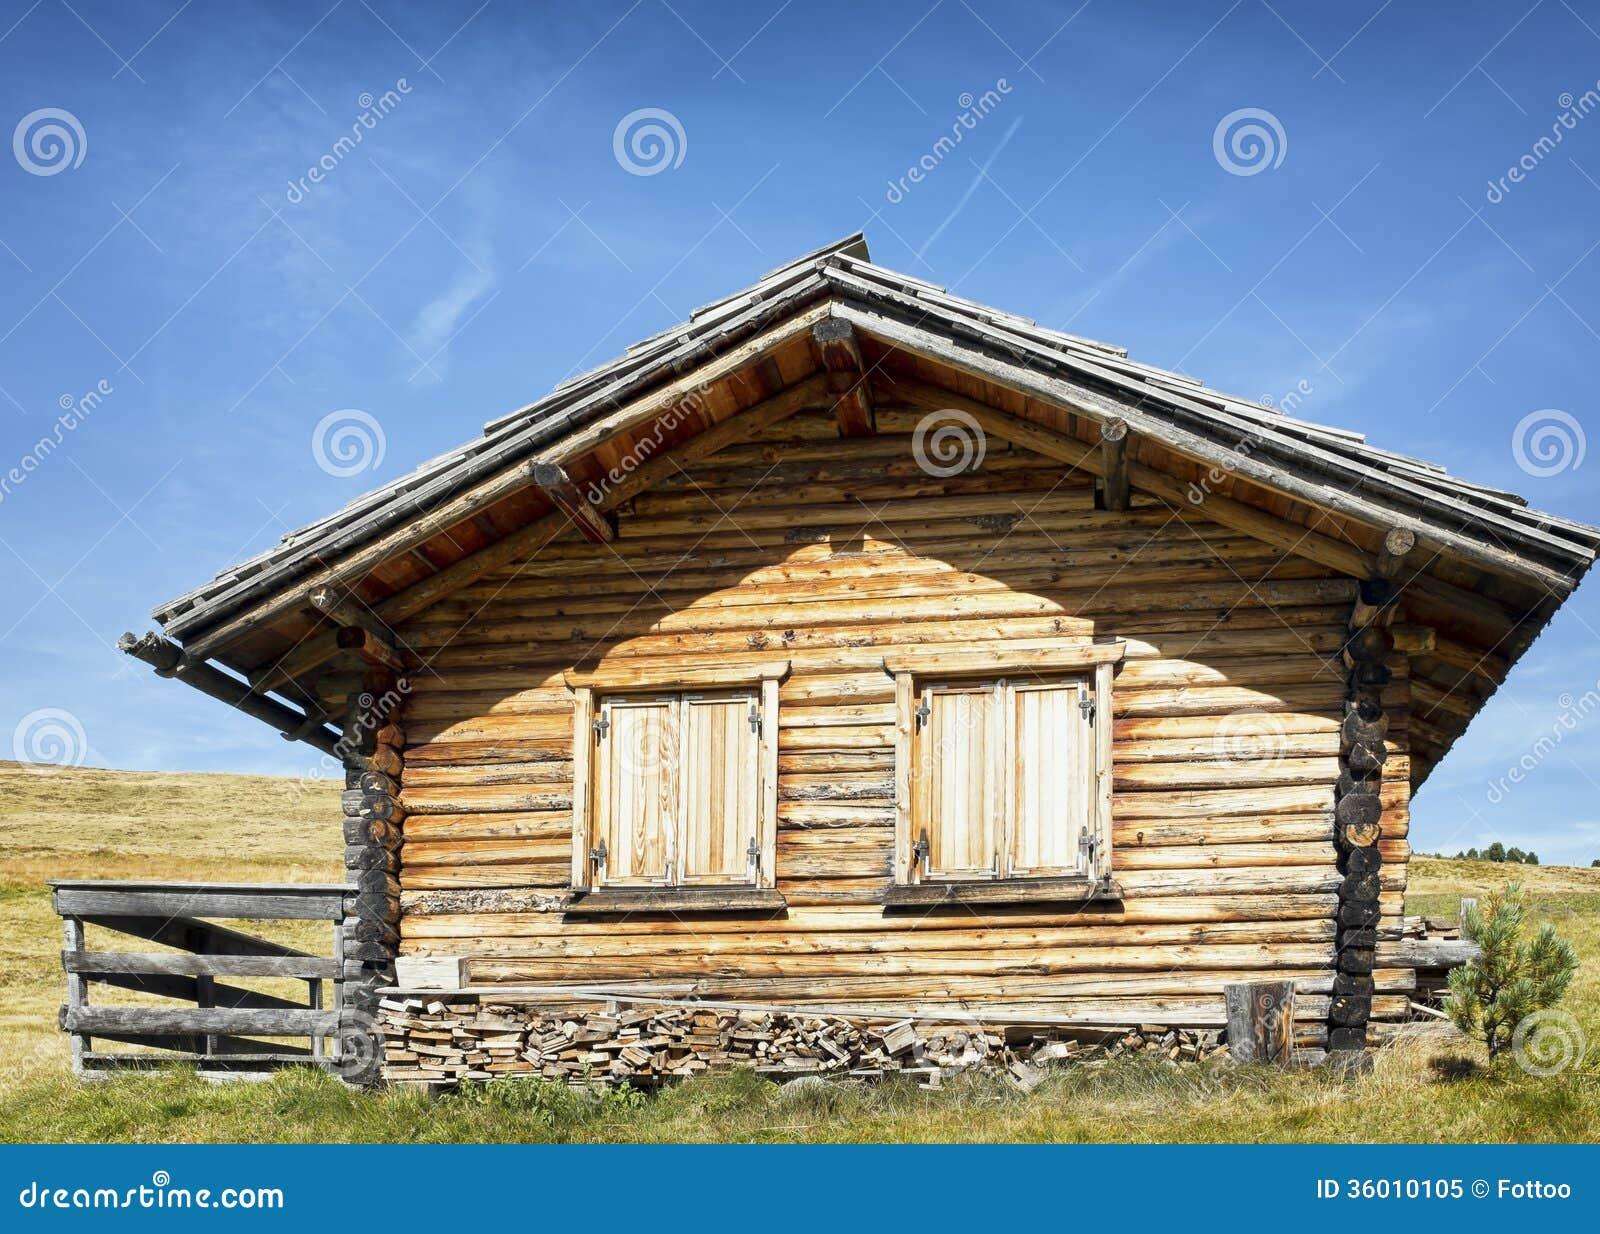 Log Cabin Royalty Free Stock Photo Image 36010105